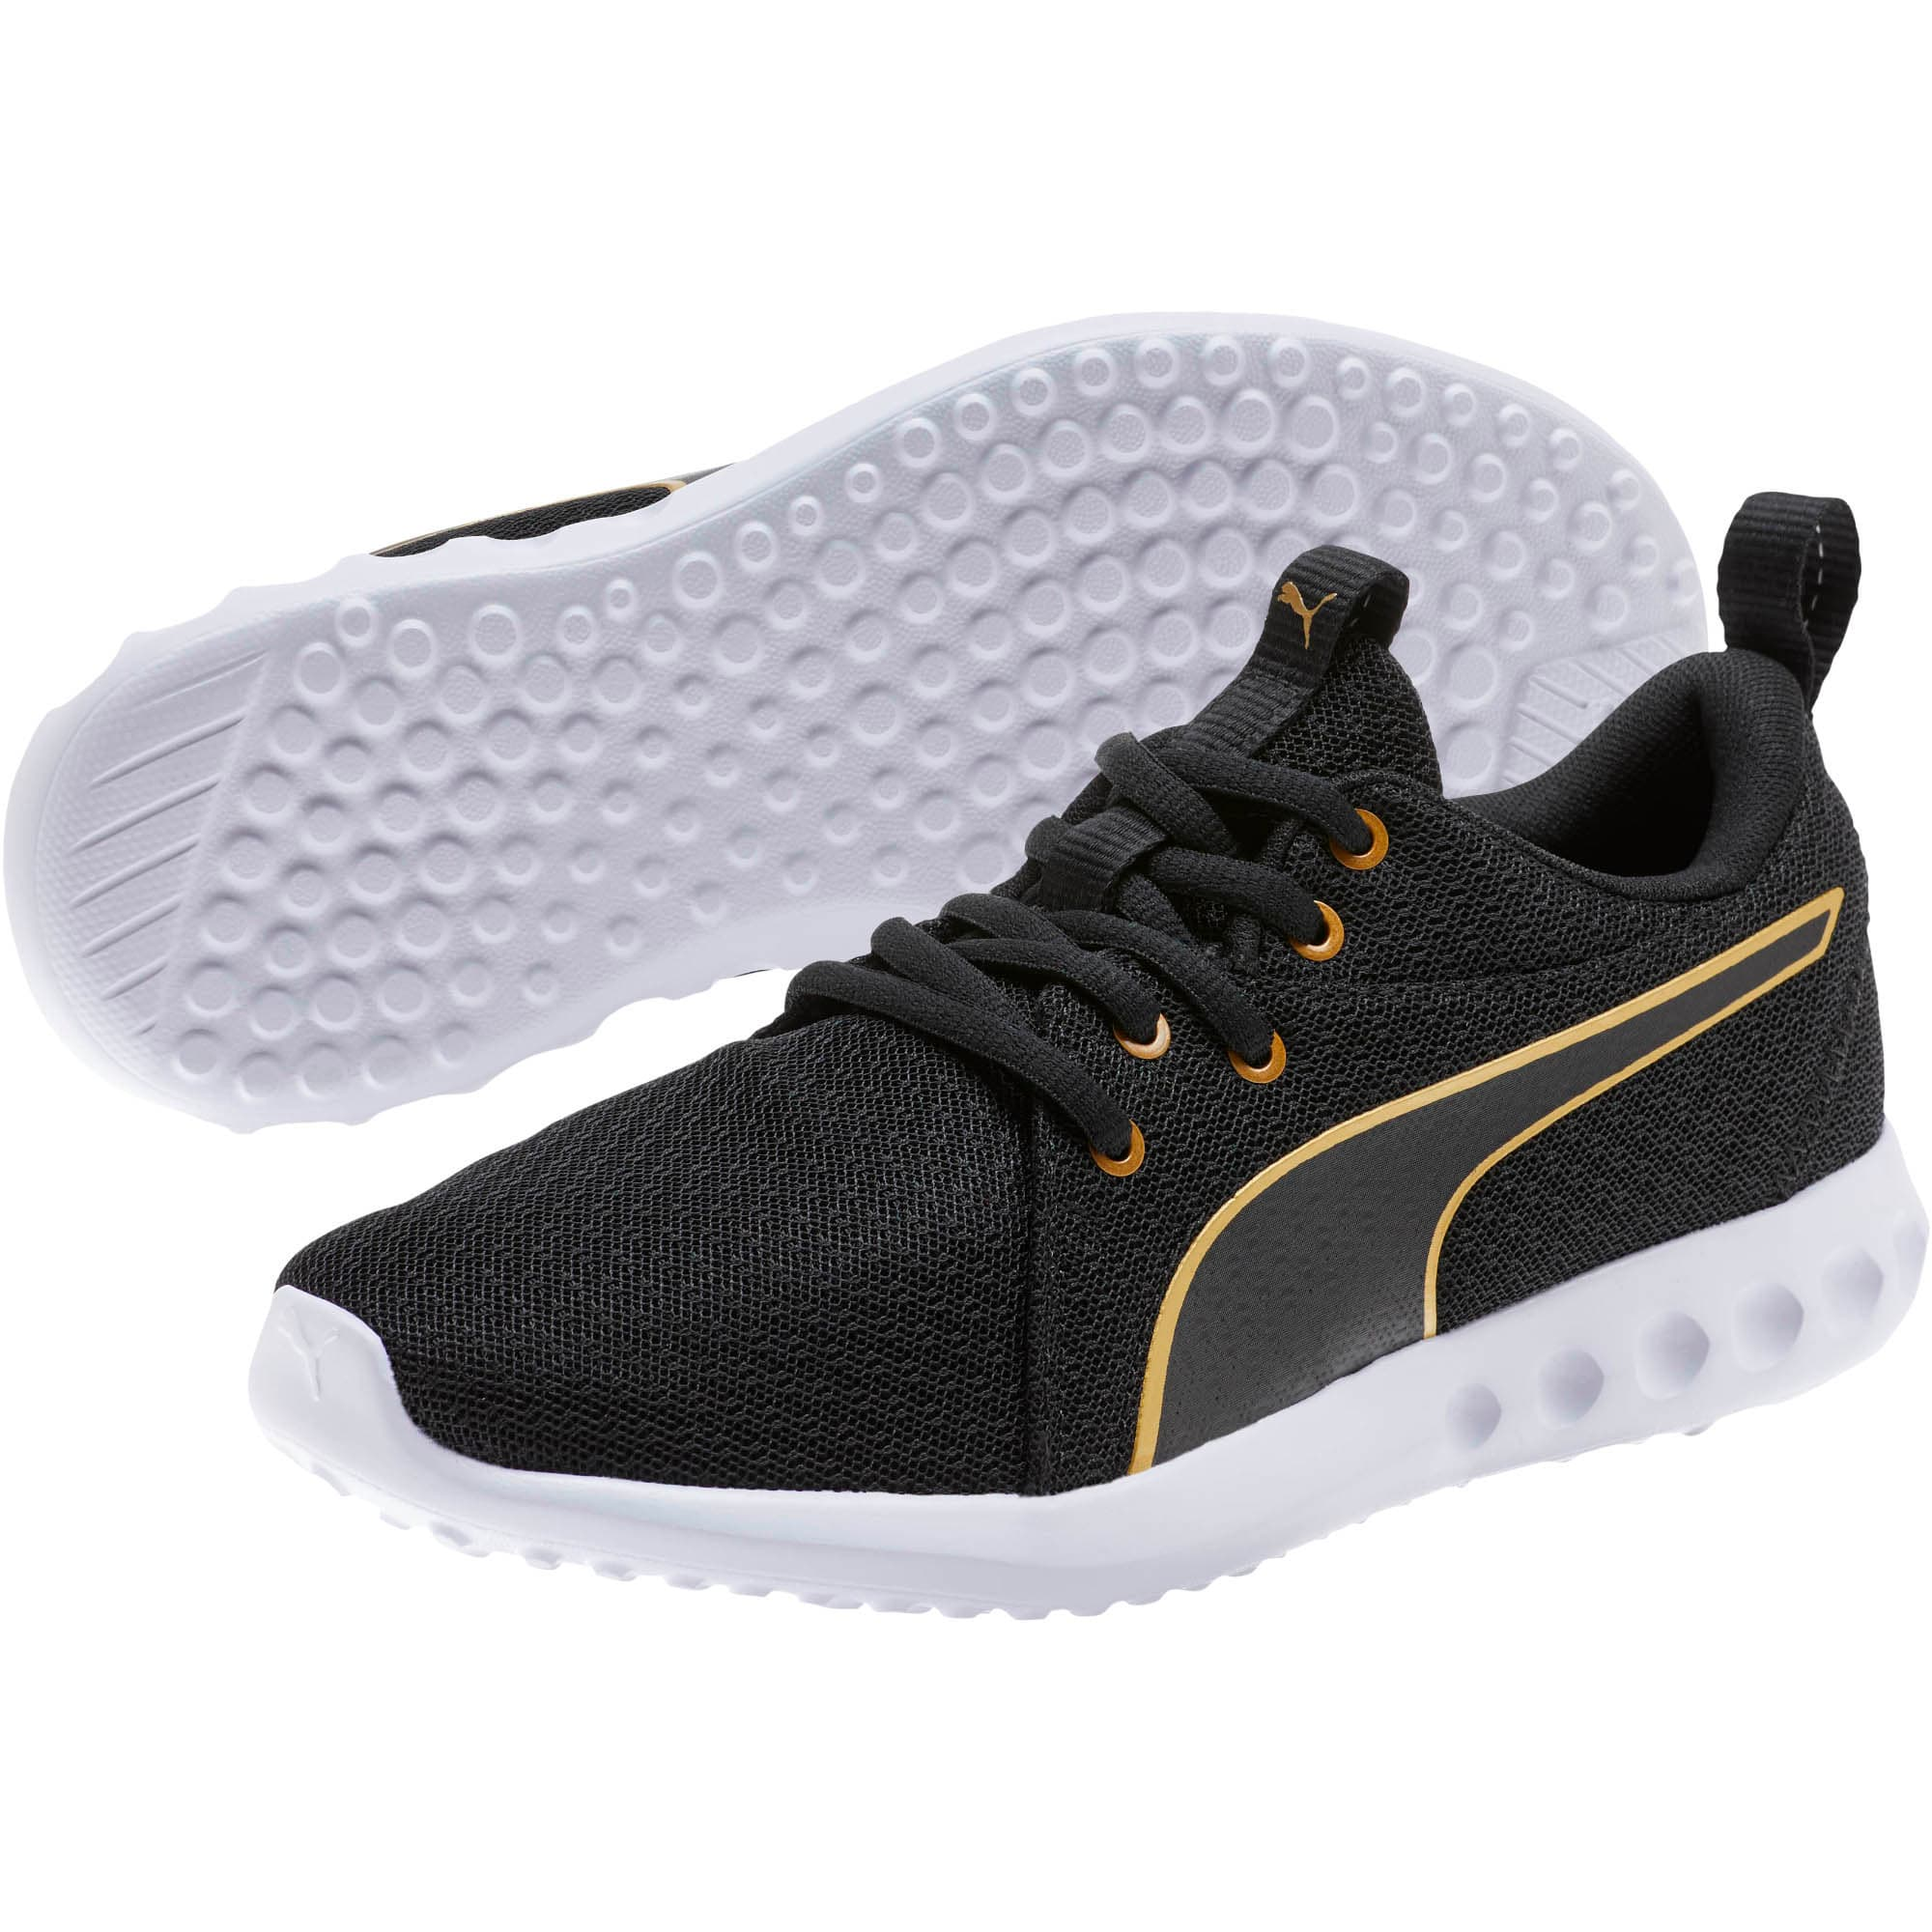 Thumbnail 2 of Carson 2 Metallic Mesh Shoes JR, Puma Black-Gold, medium